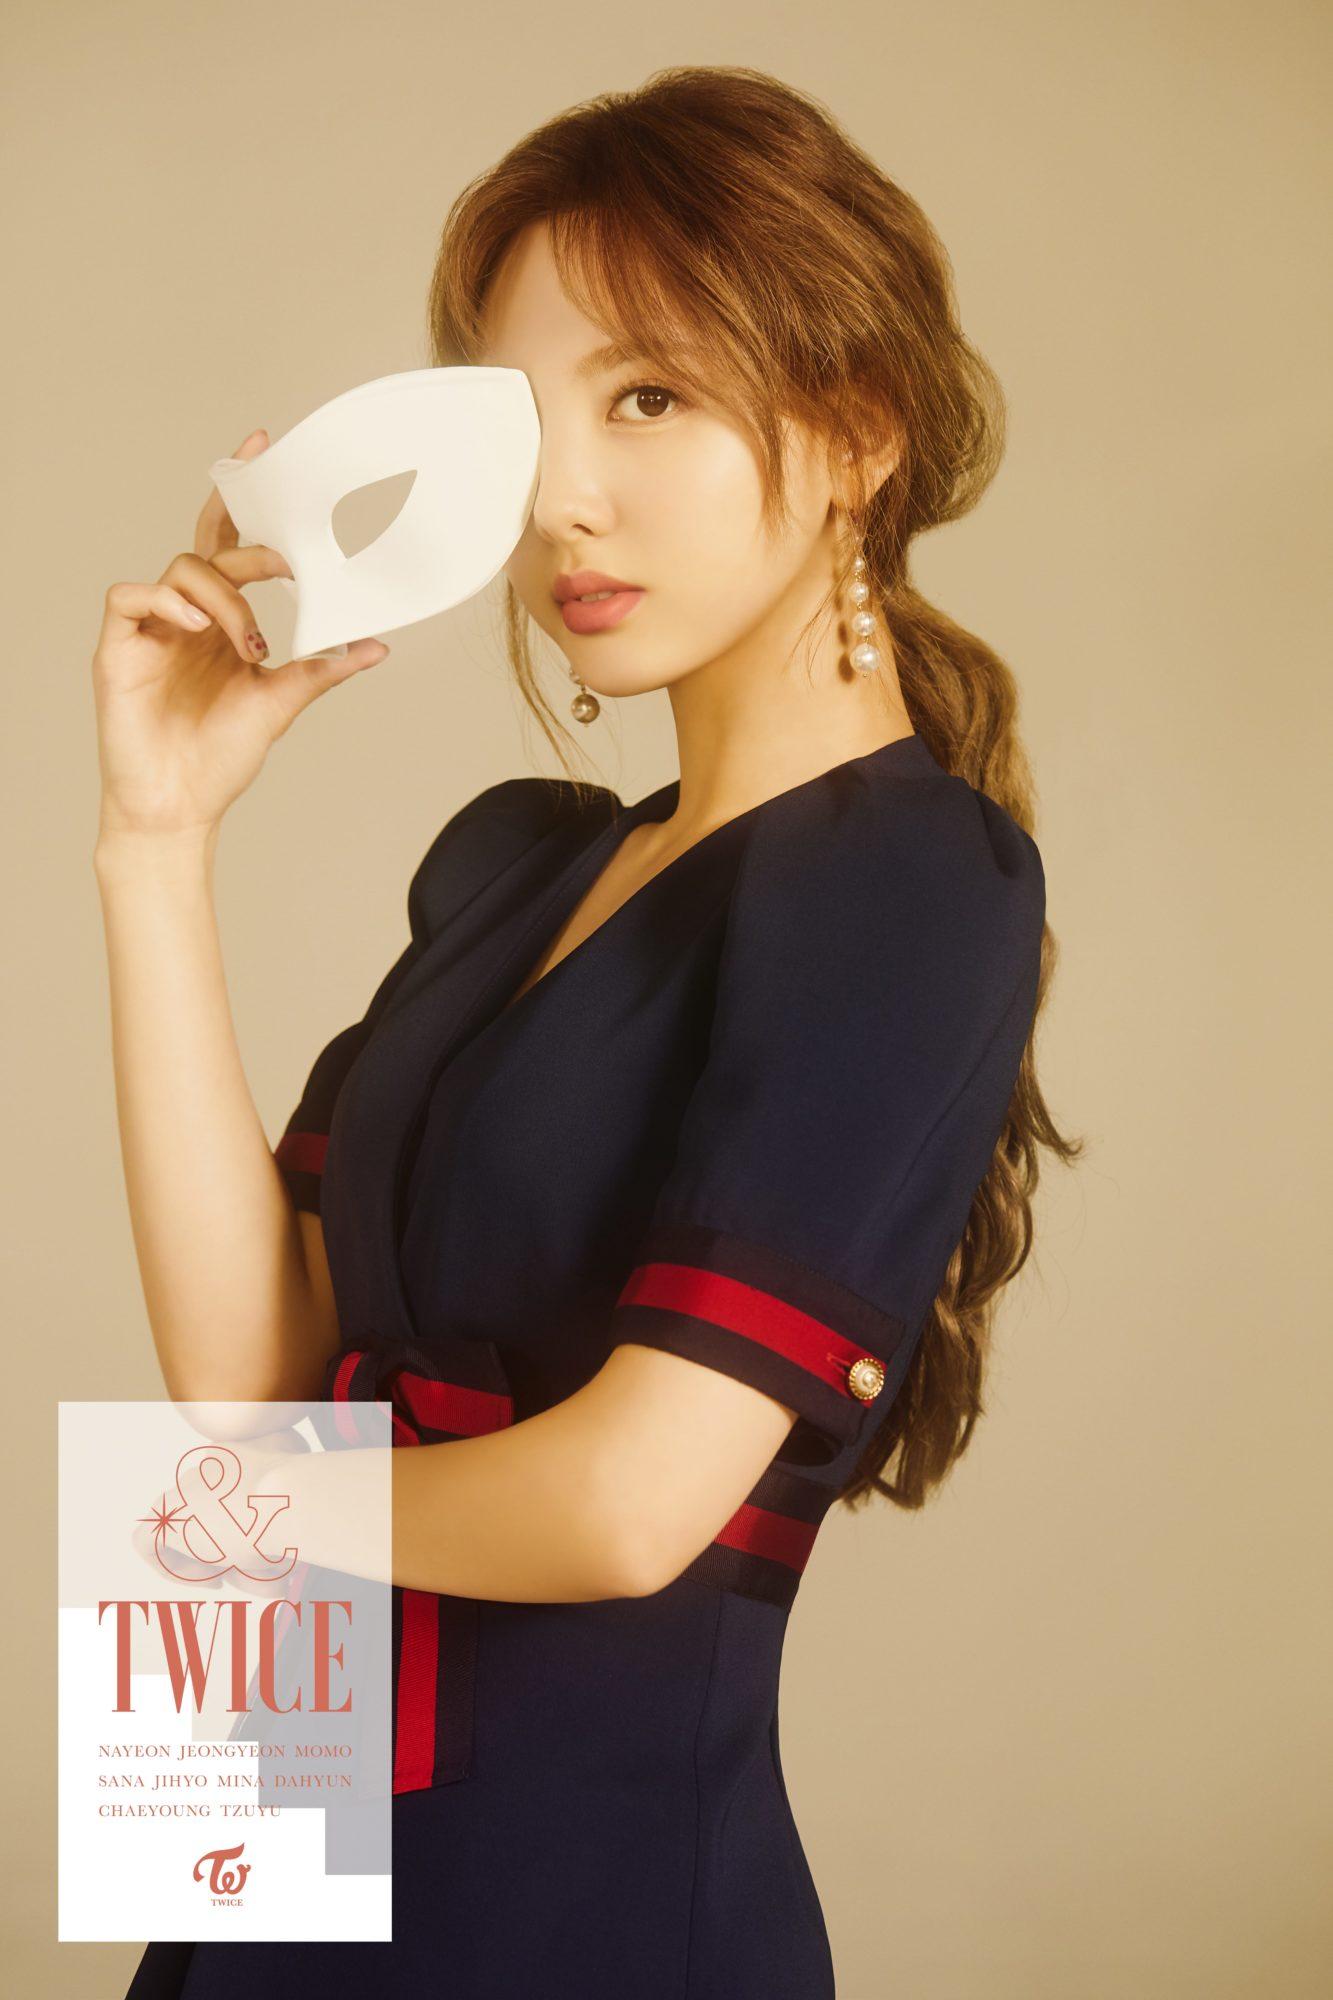 Twice &Twice Concept Nayeon